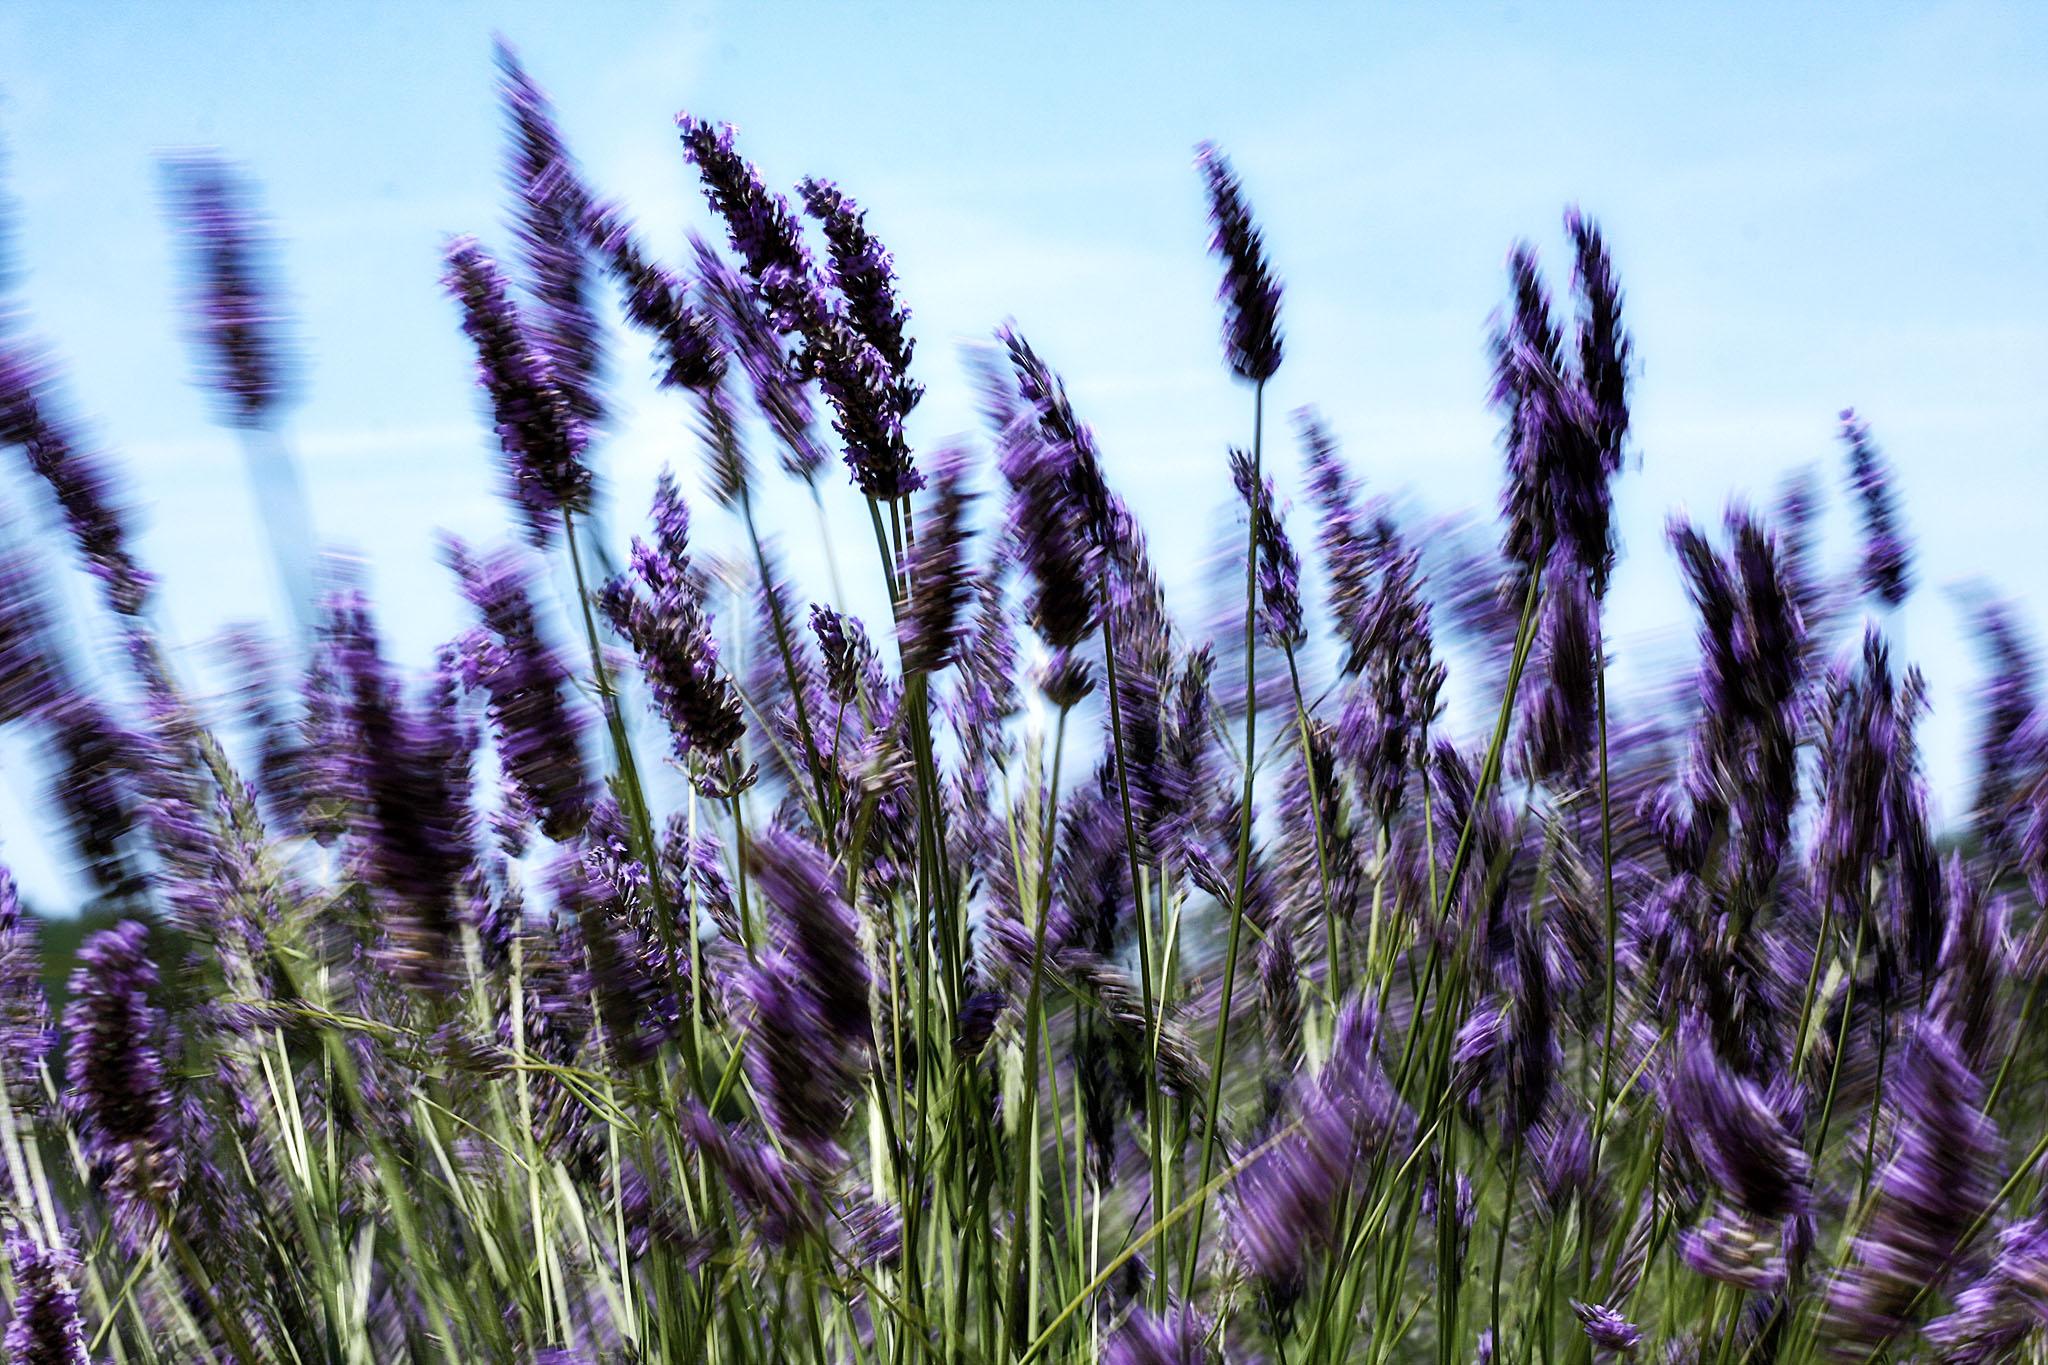 Melinda Isachsen JANIS Photography & Fine Art lavender Provence France